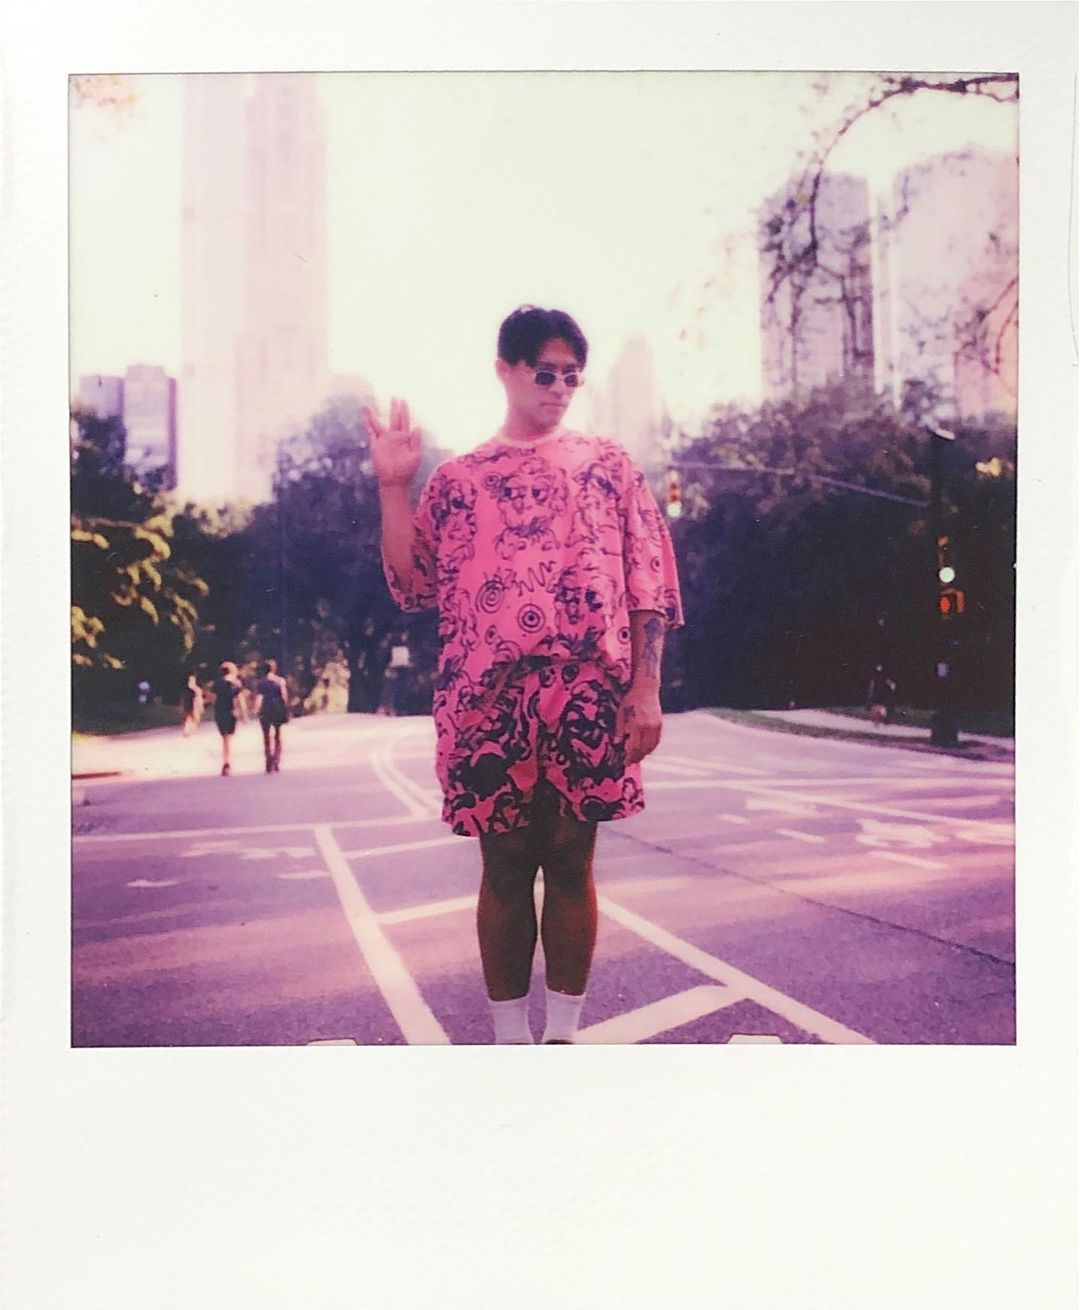 Ryan Rudewicz polaroid pink outfit